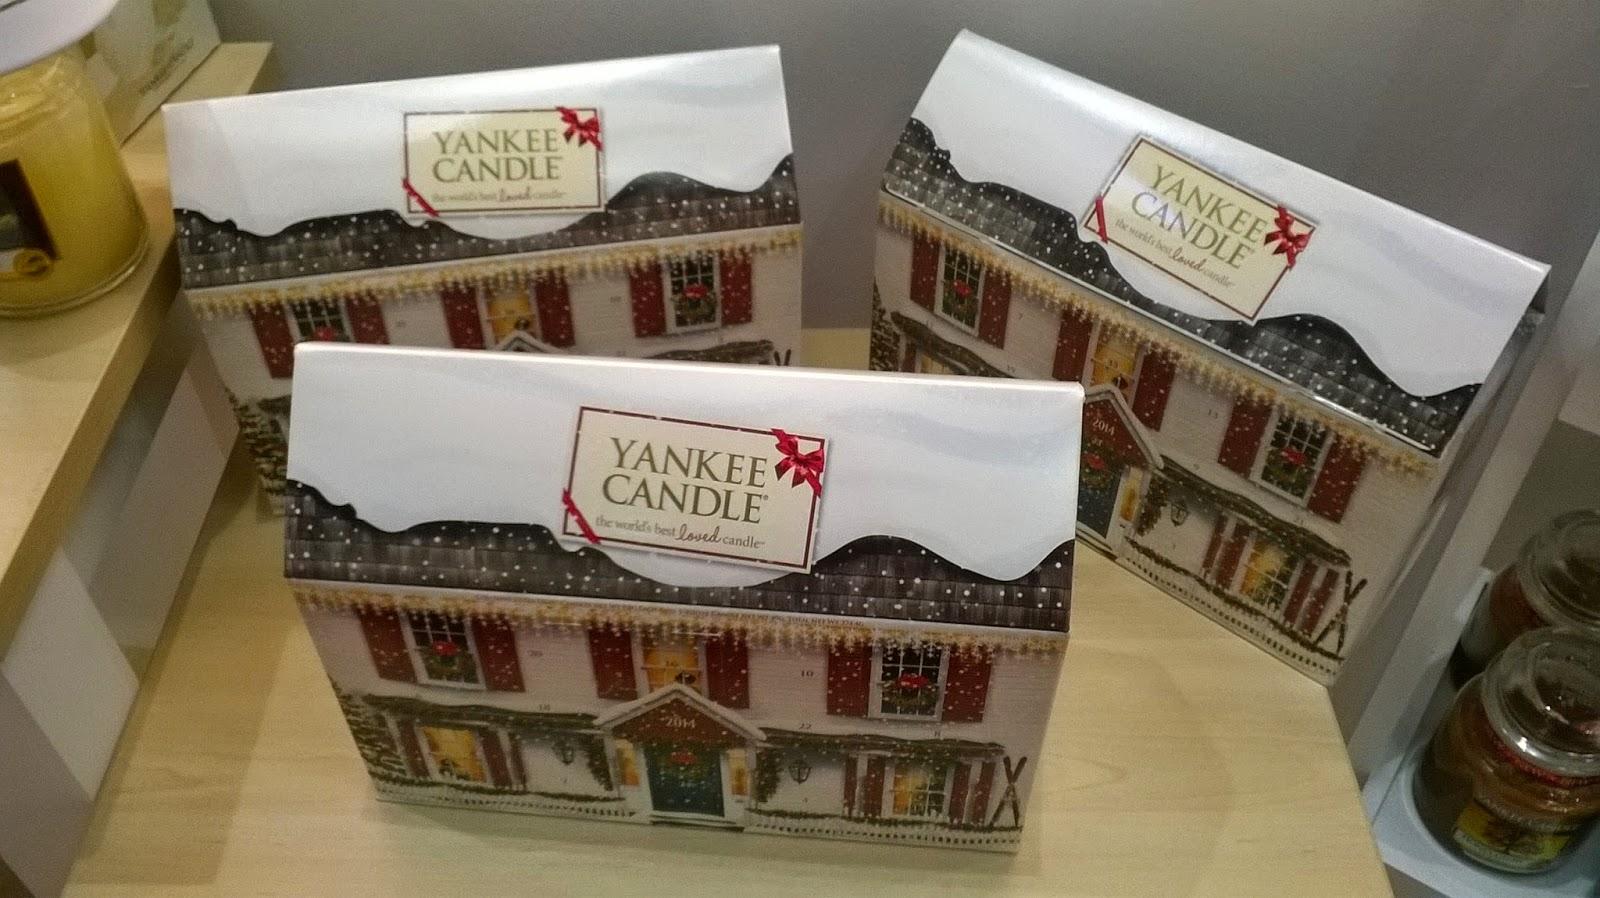 Stand Yankee Candle Expohogar Otoño 2014